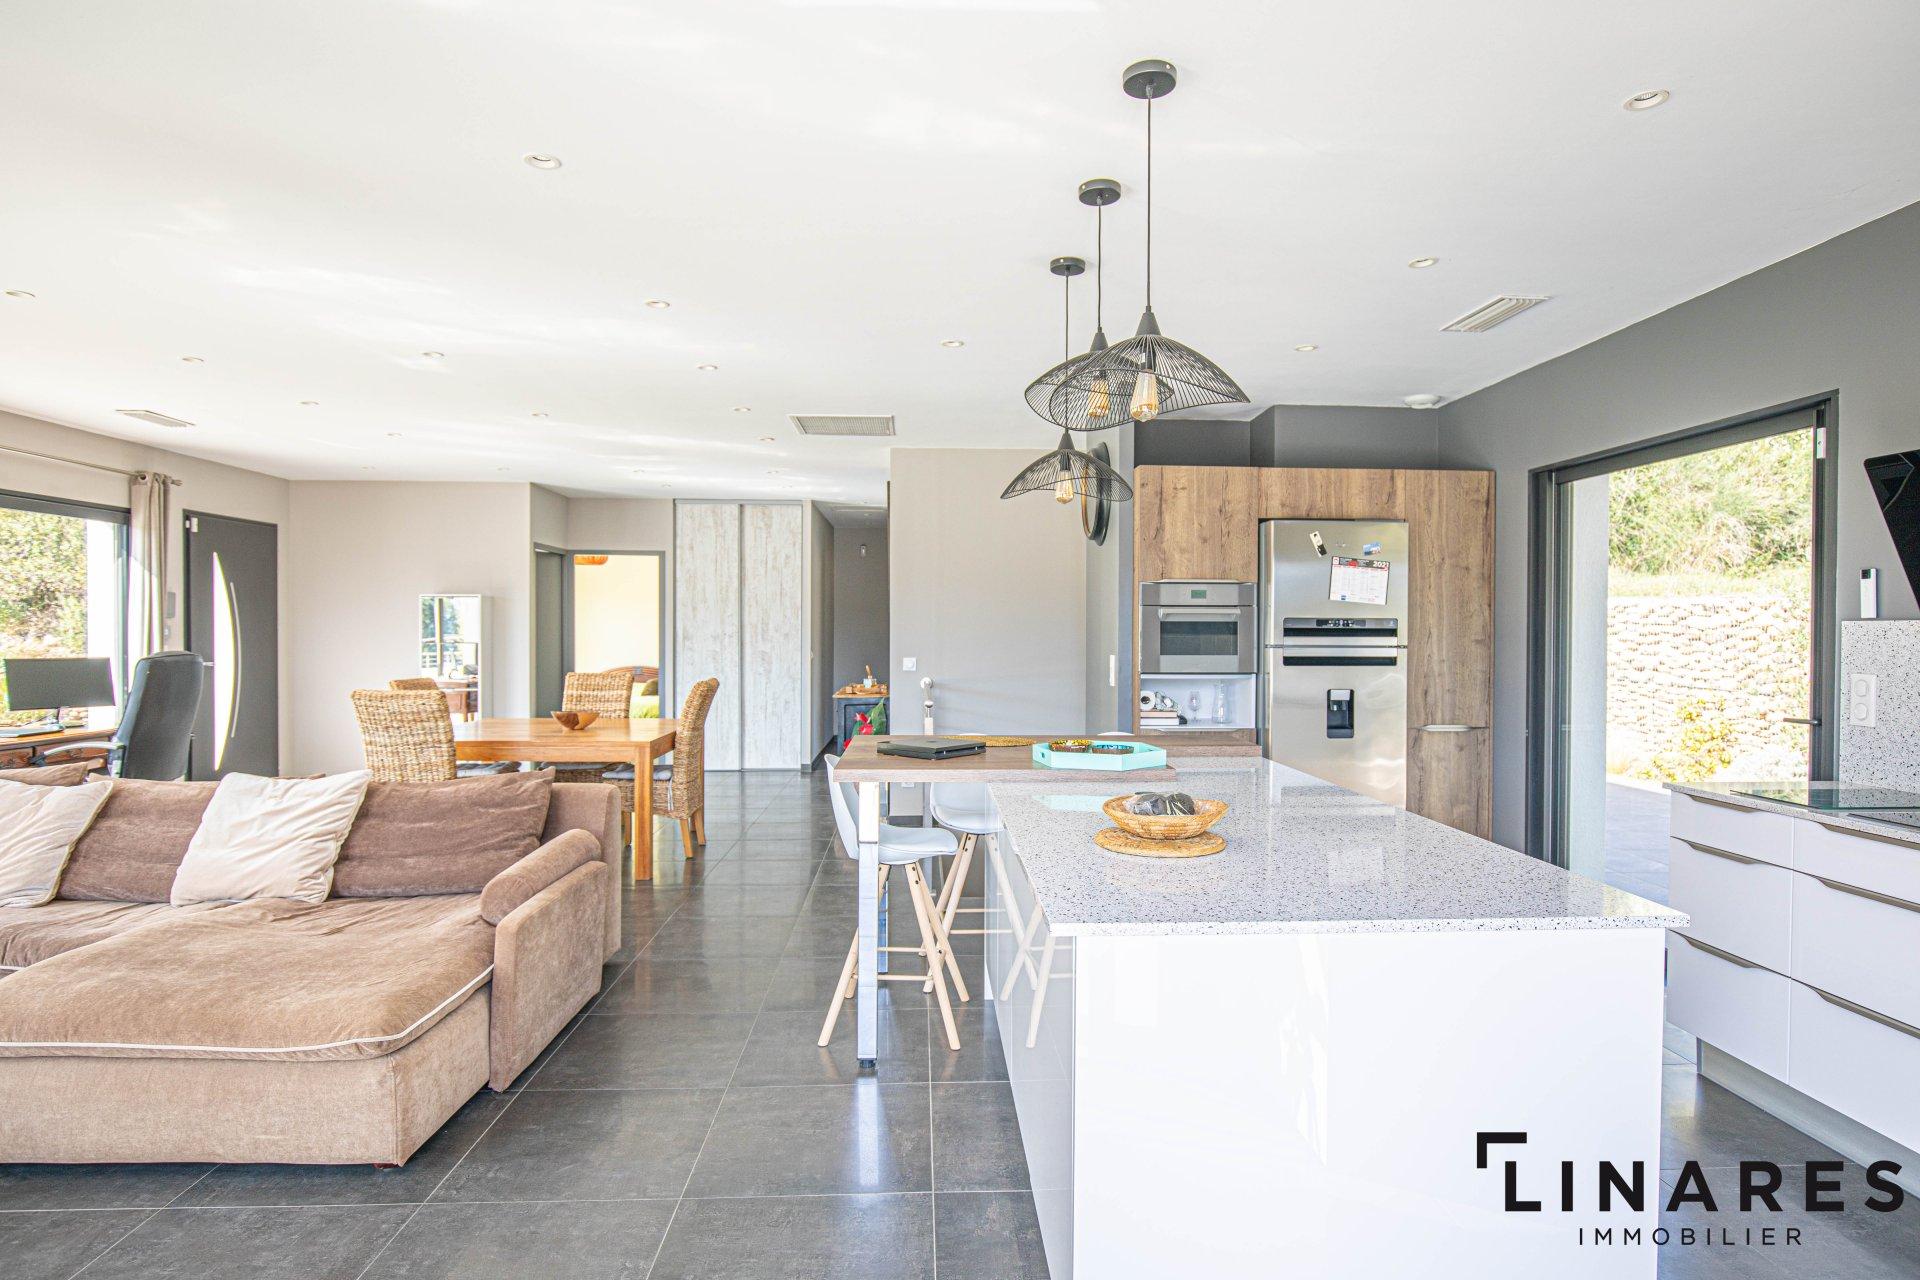 LA SURPRENANTE - Villa T4/5 de 310m2 (210+100) -Terrain 4000m2